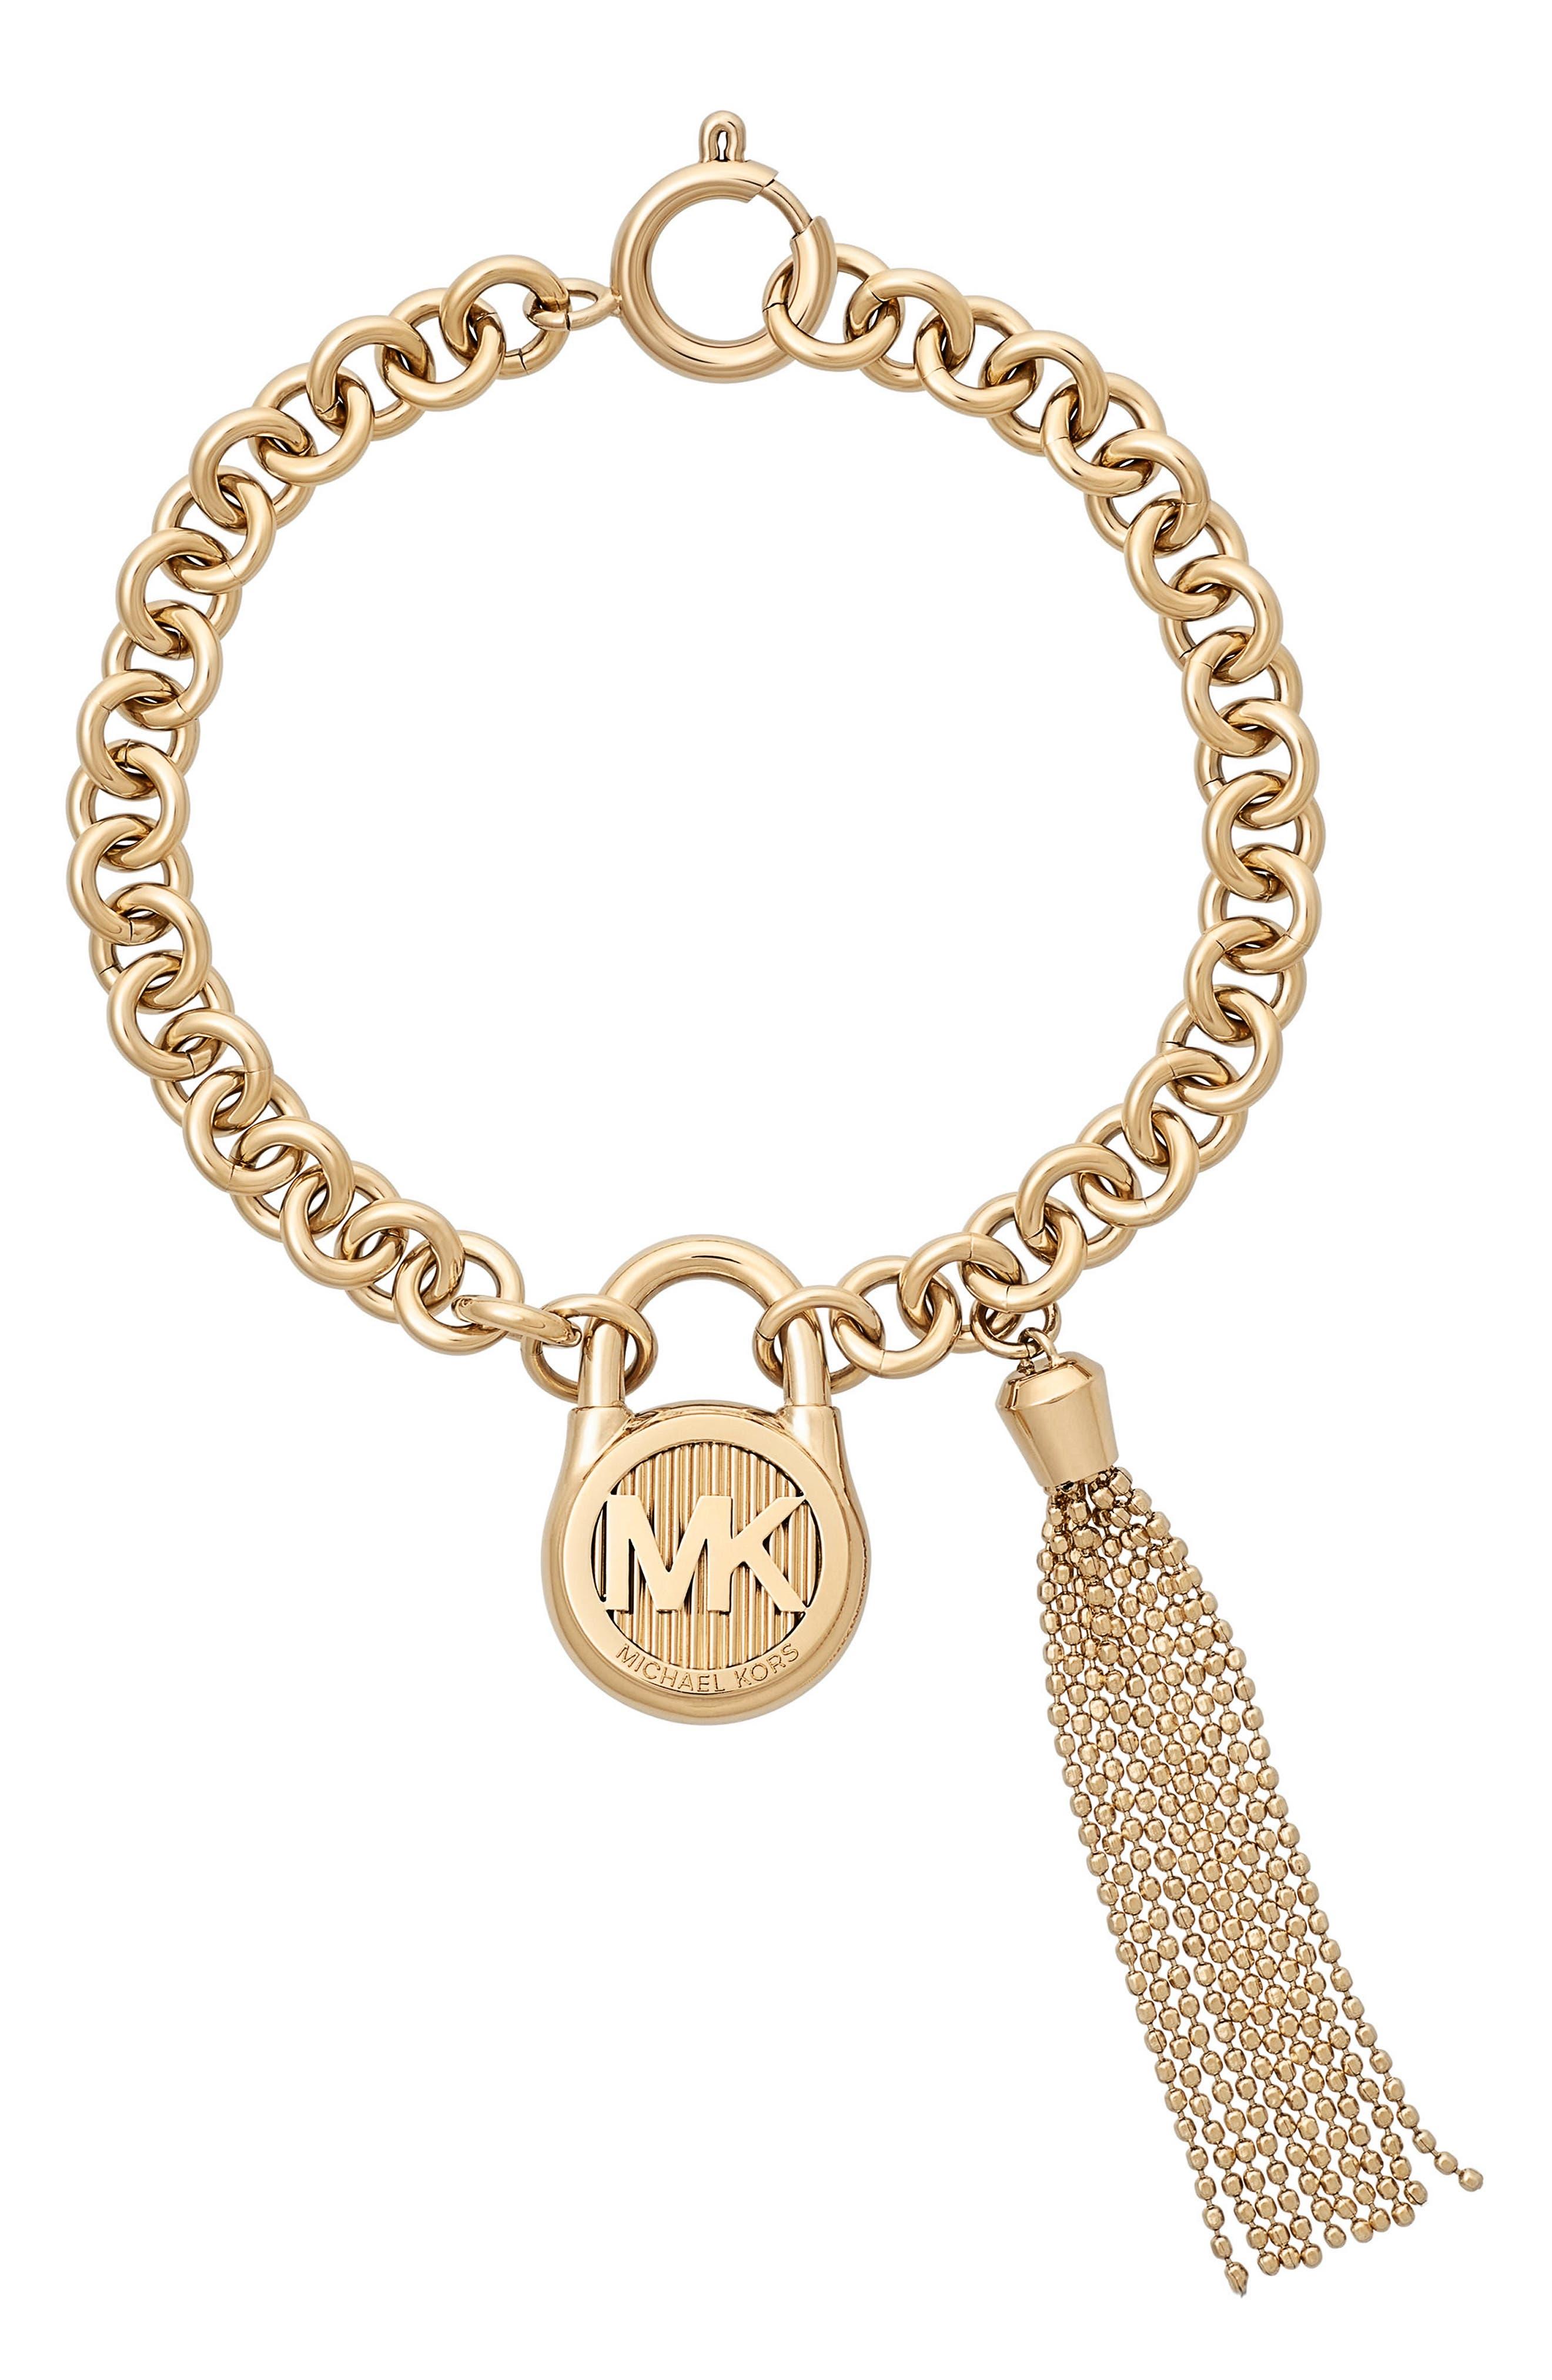 Main Image - Michael Kors Link Charm Bracelet